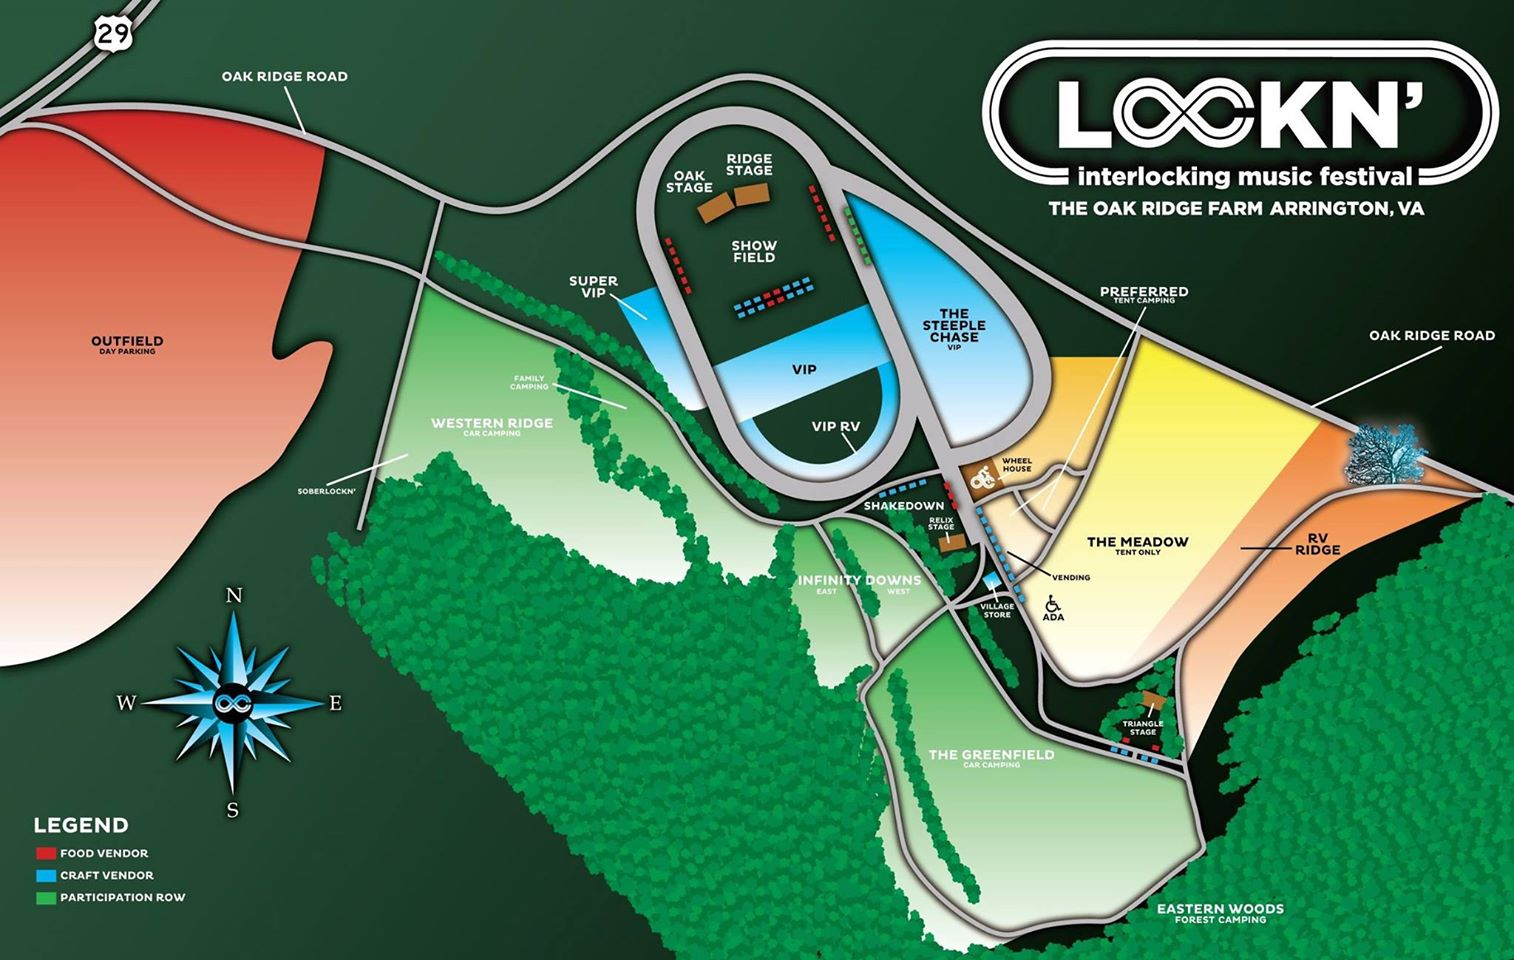 LOCKN\' Festival 2014 Map – Family of Festivals | Festivals, Concerts ...